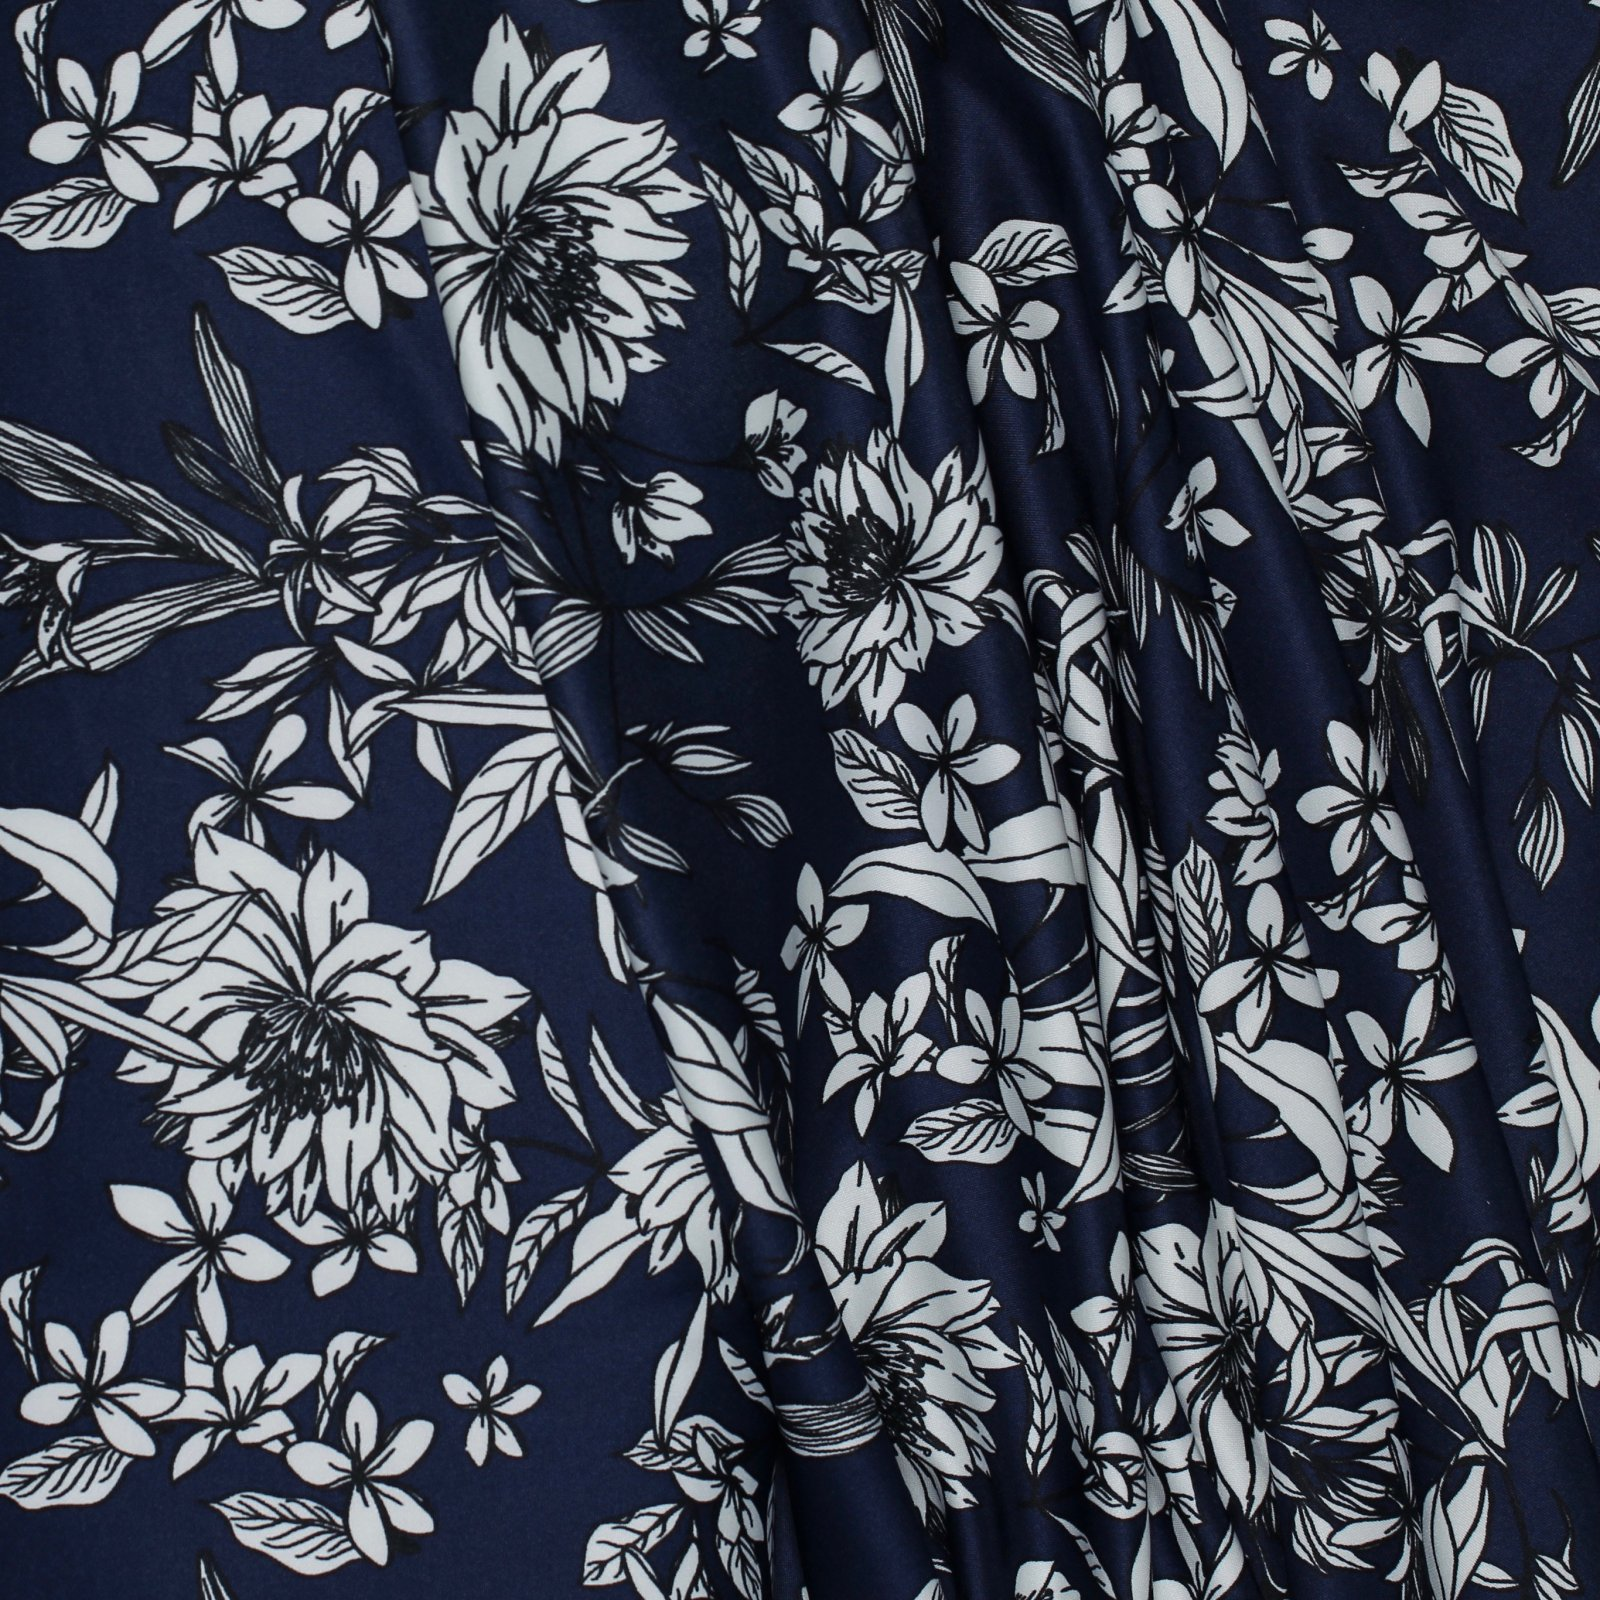 Floral Line Art Techno Knit